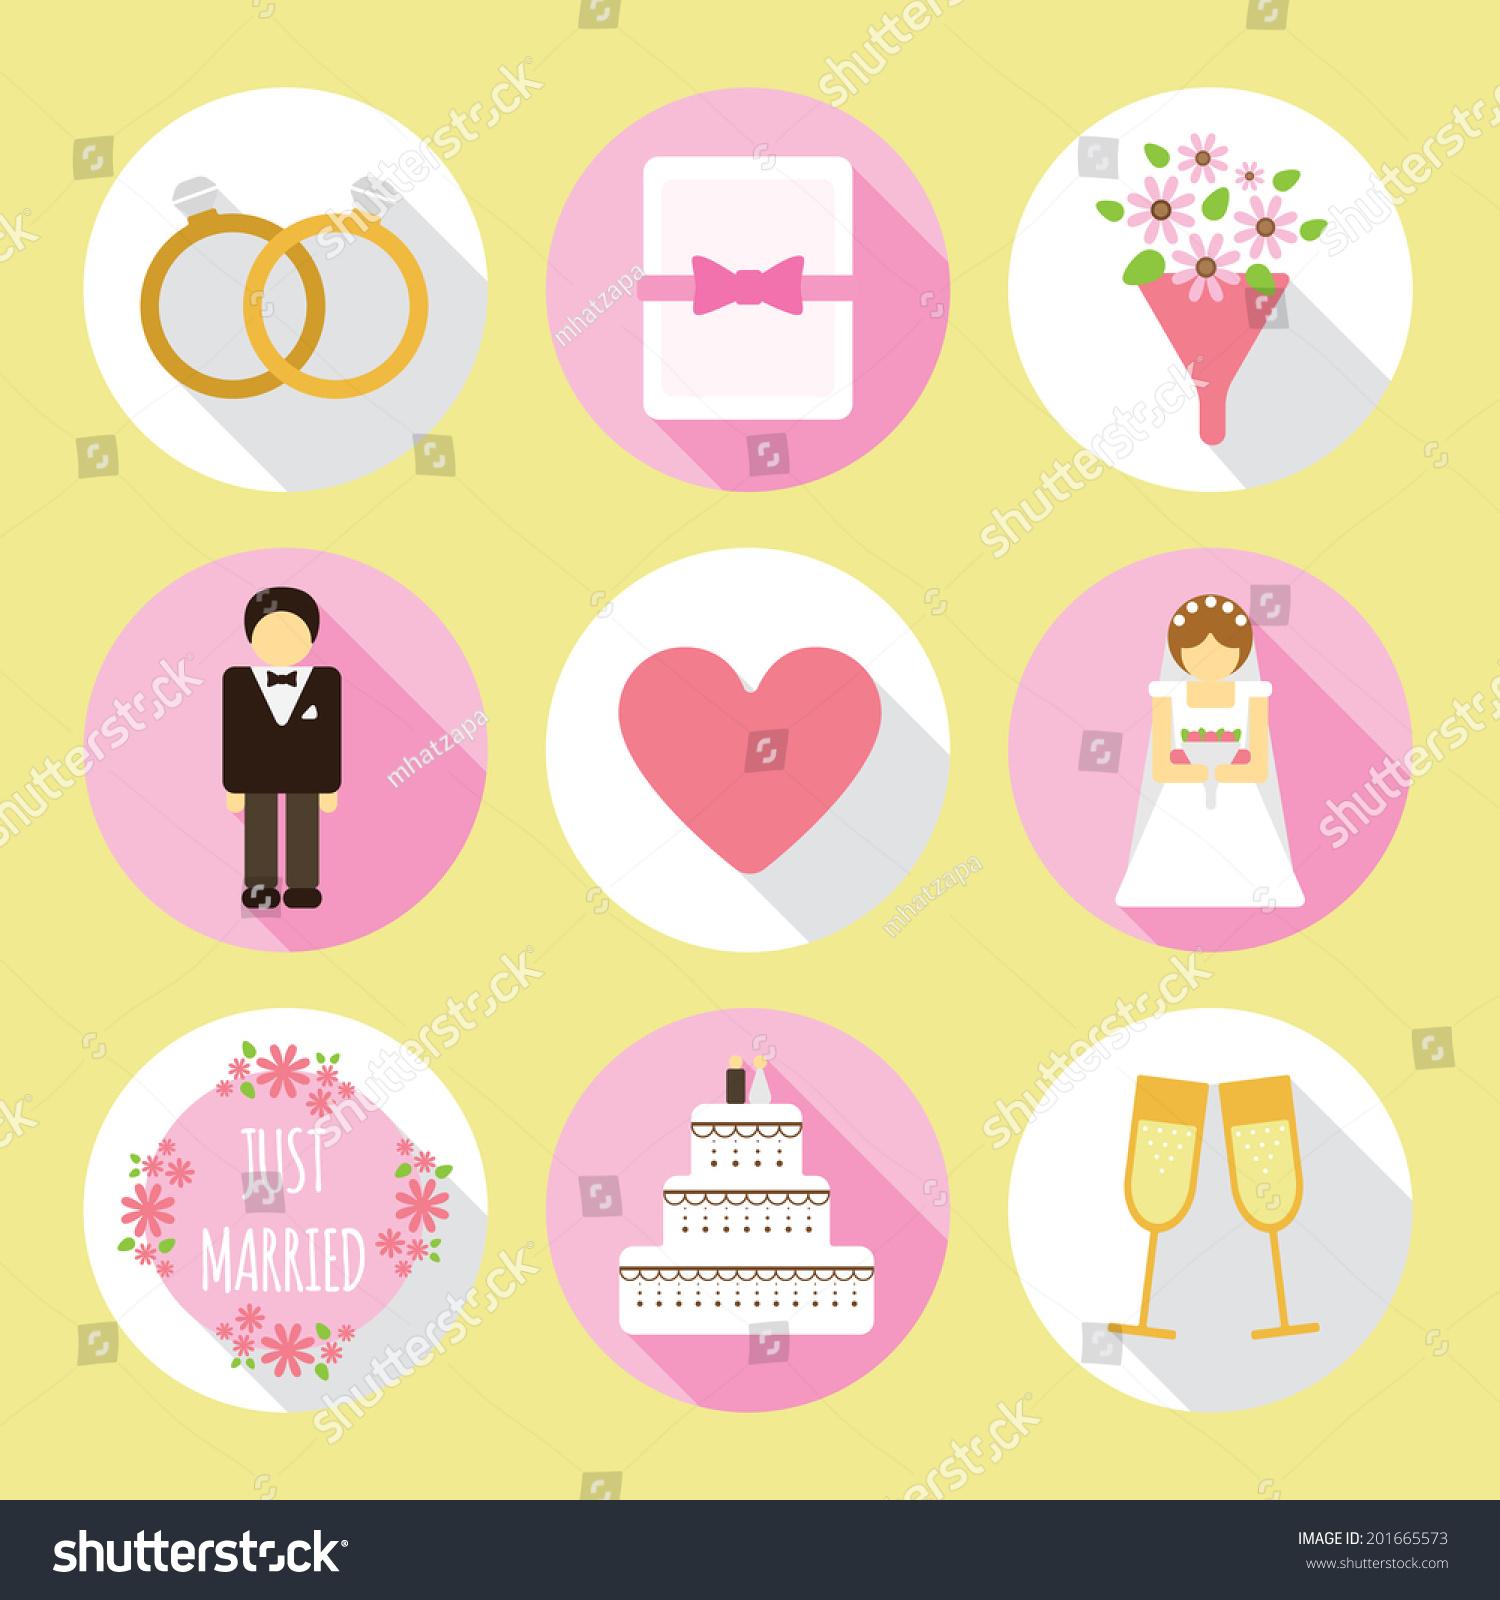 Circle Wedding Flat Icon Stock Illustration 201665573 - Shutterstock